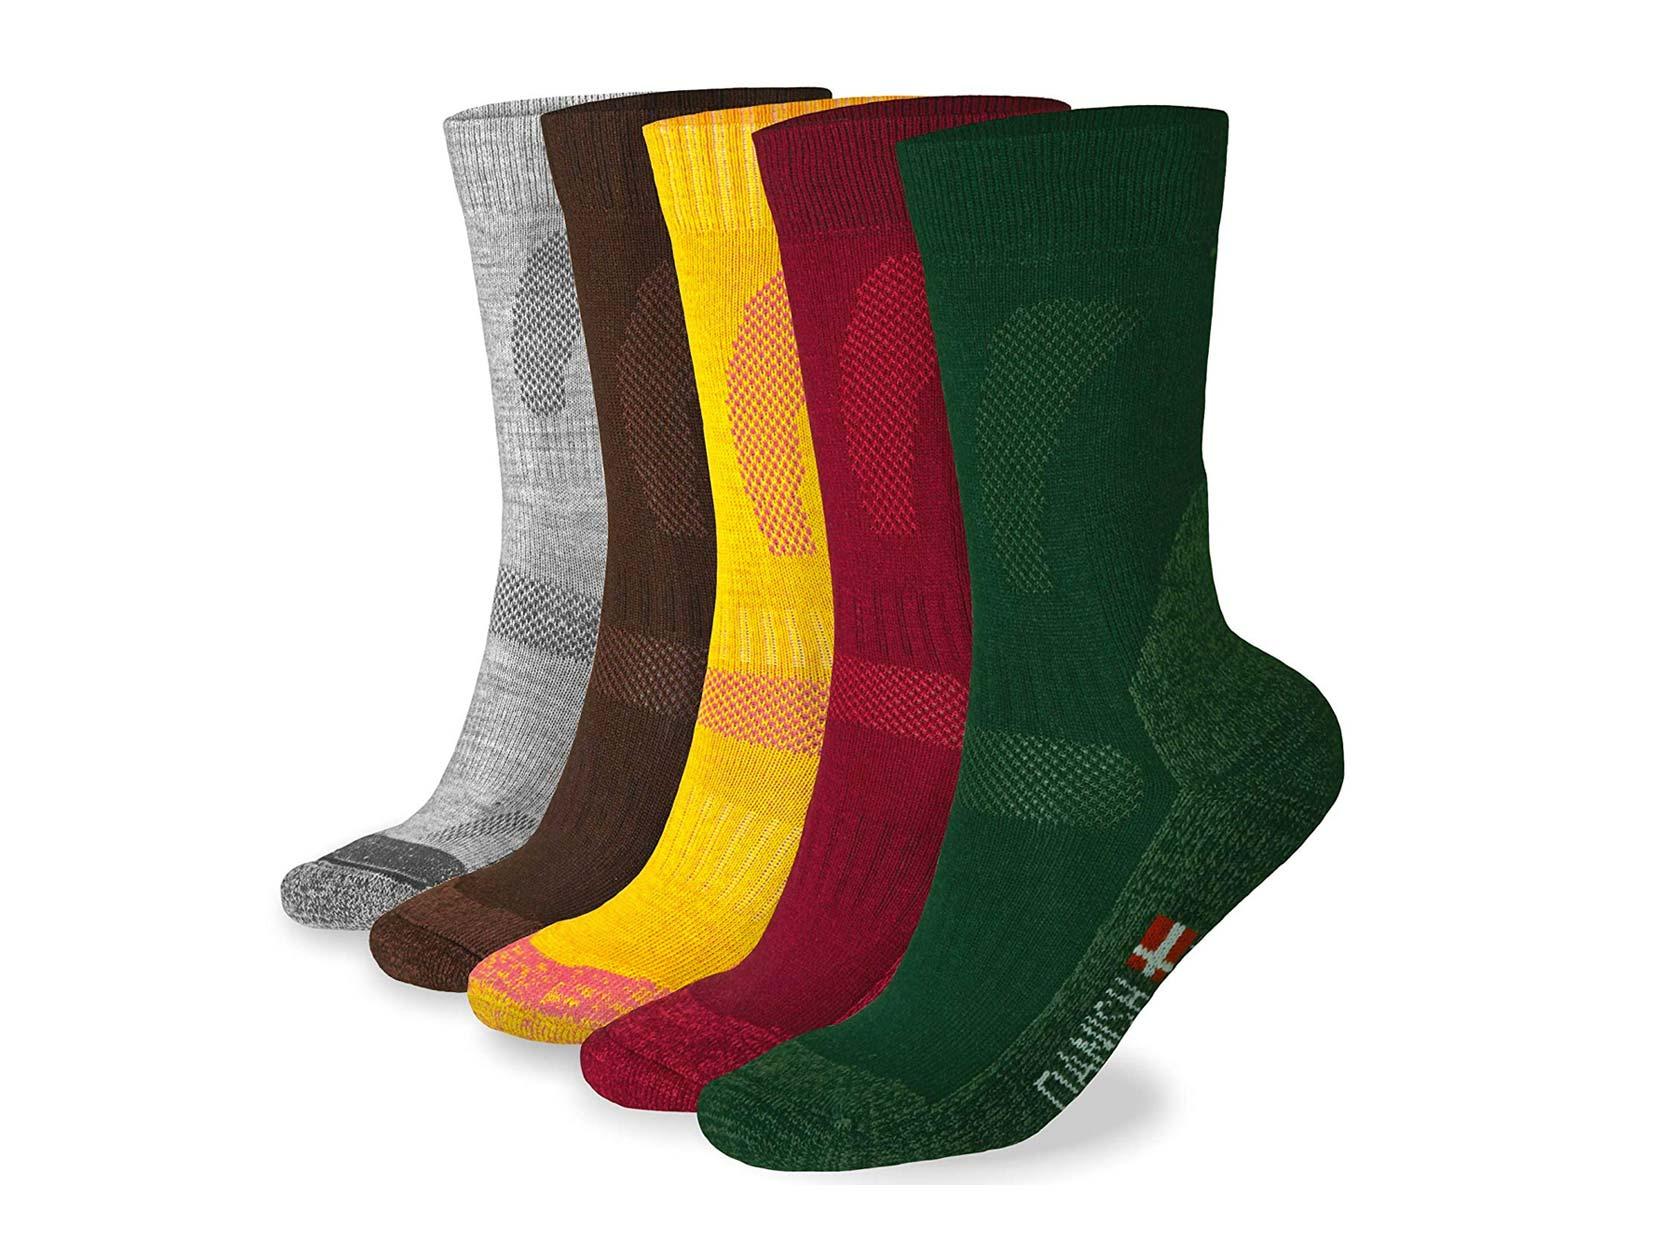 Danish Endurance wool socks